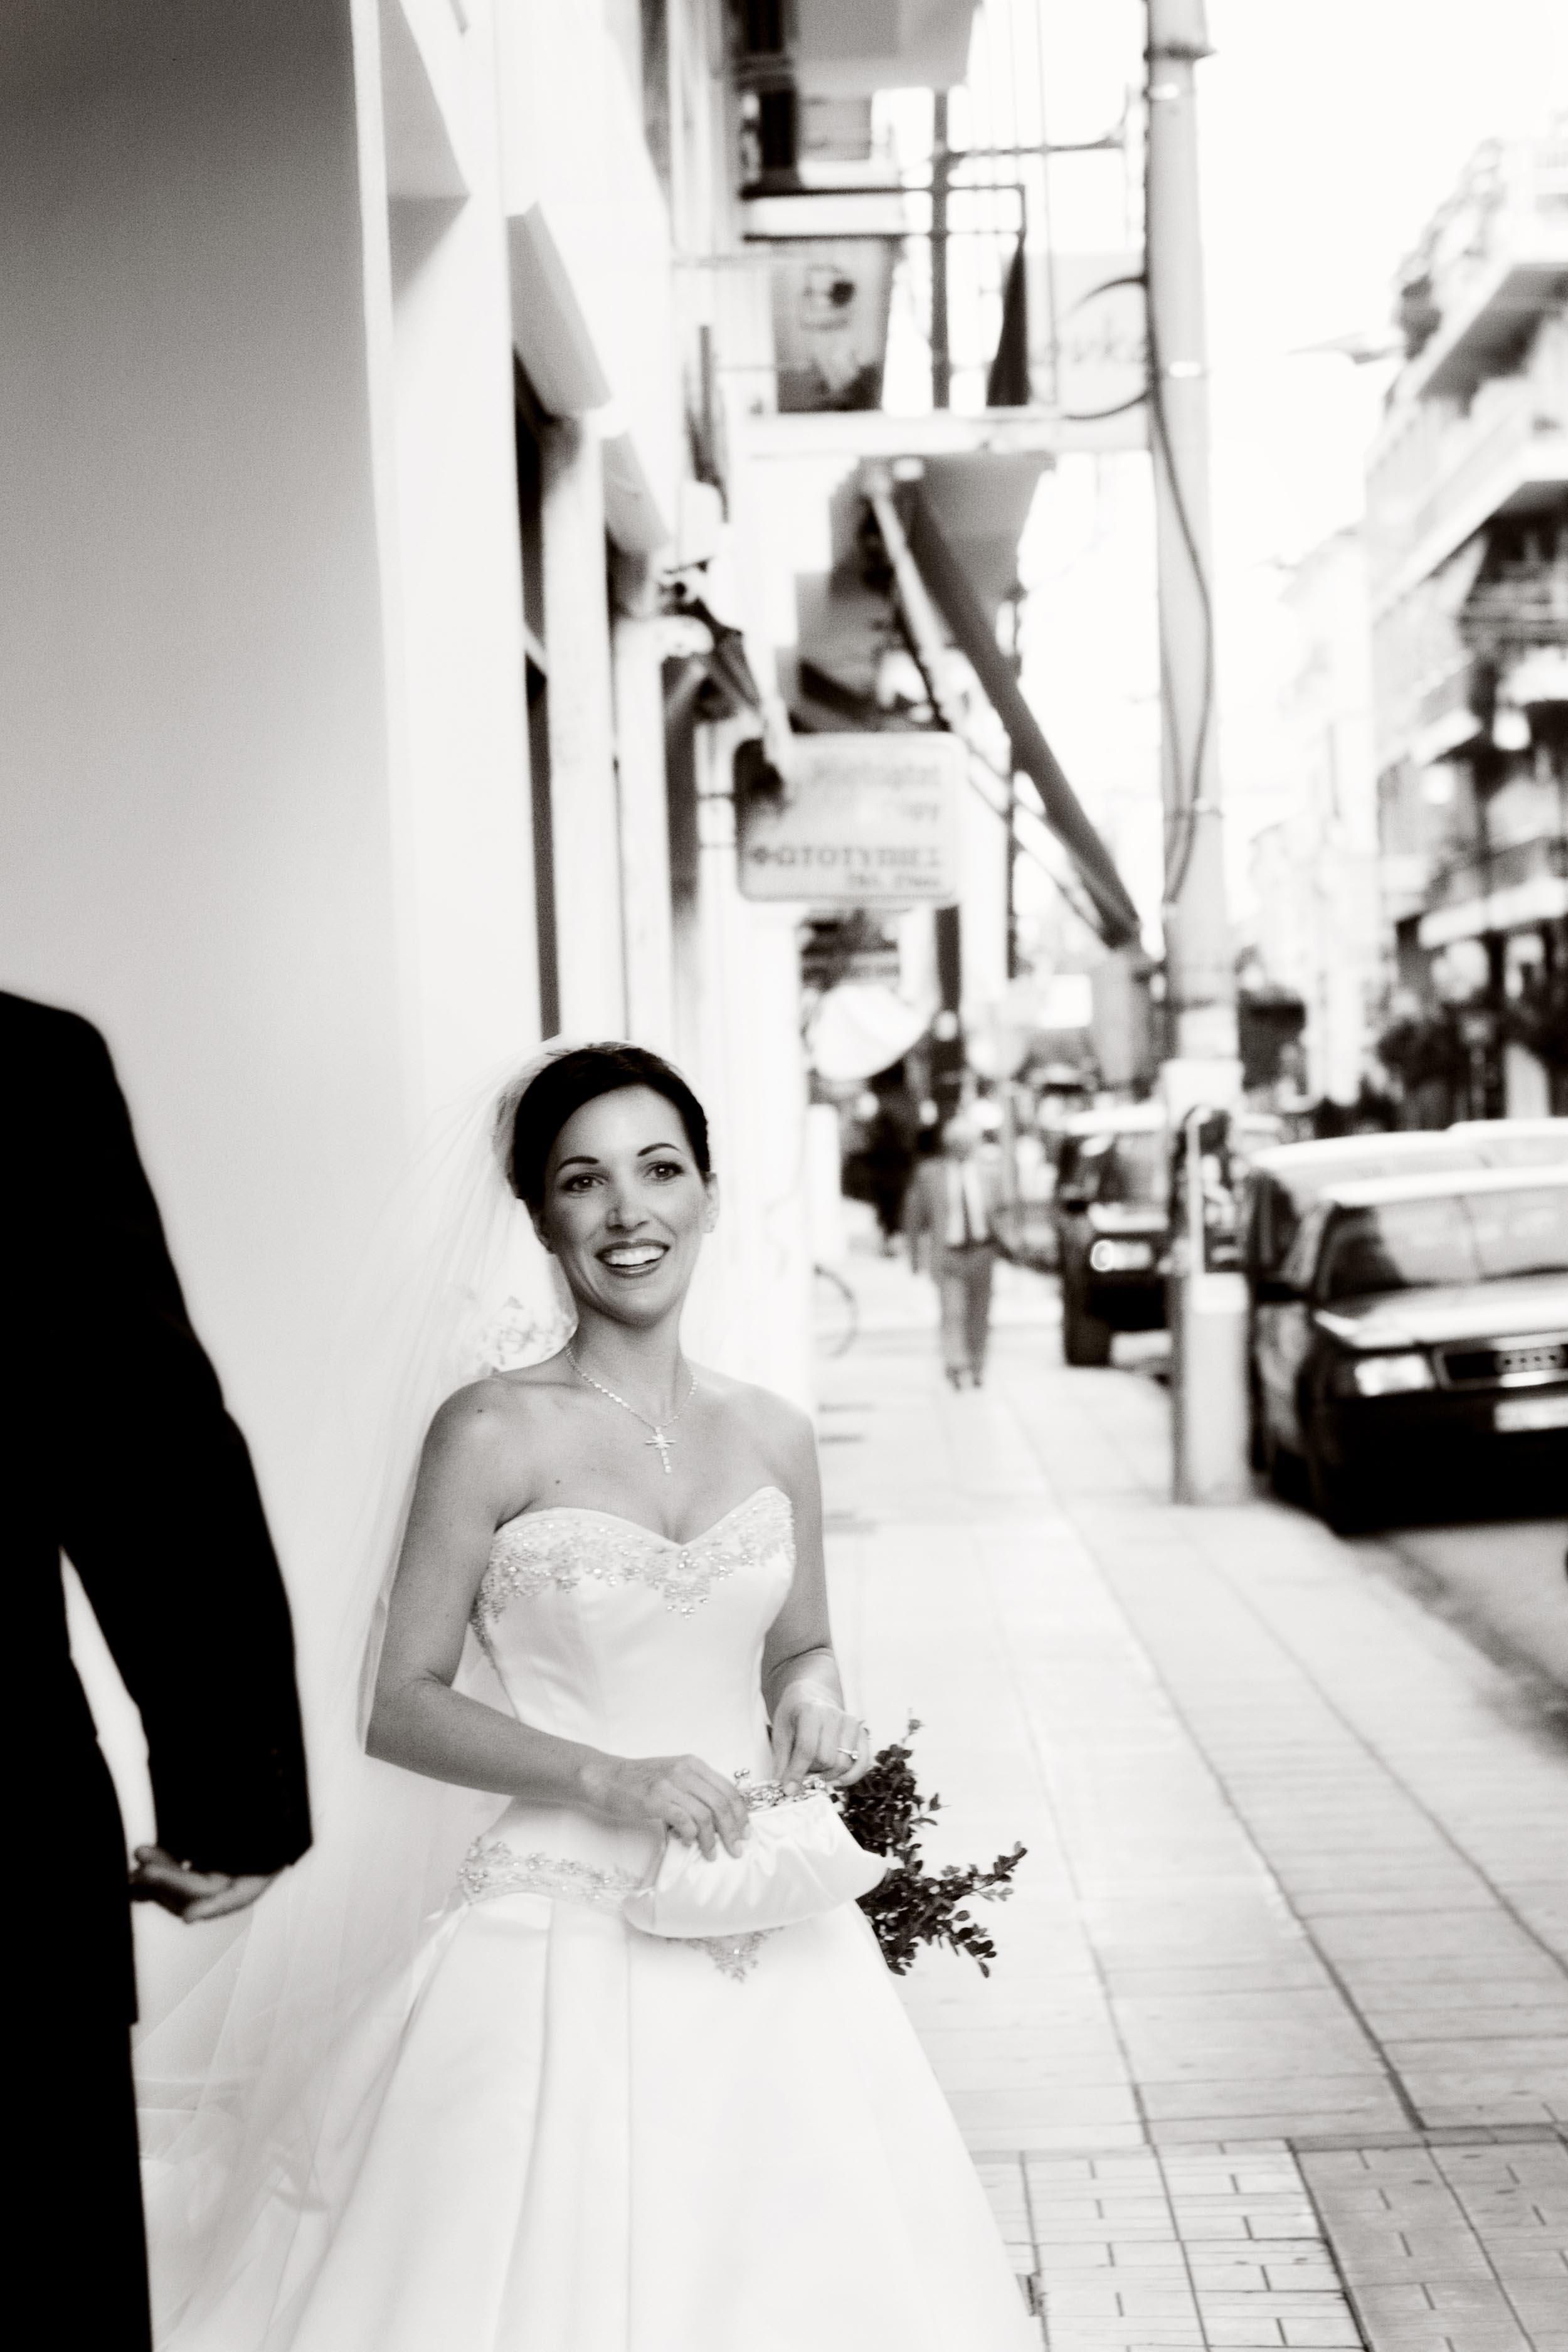 wedding-greece-07.jpg